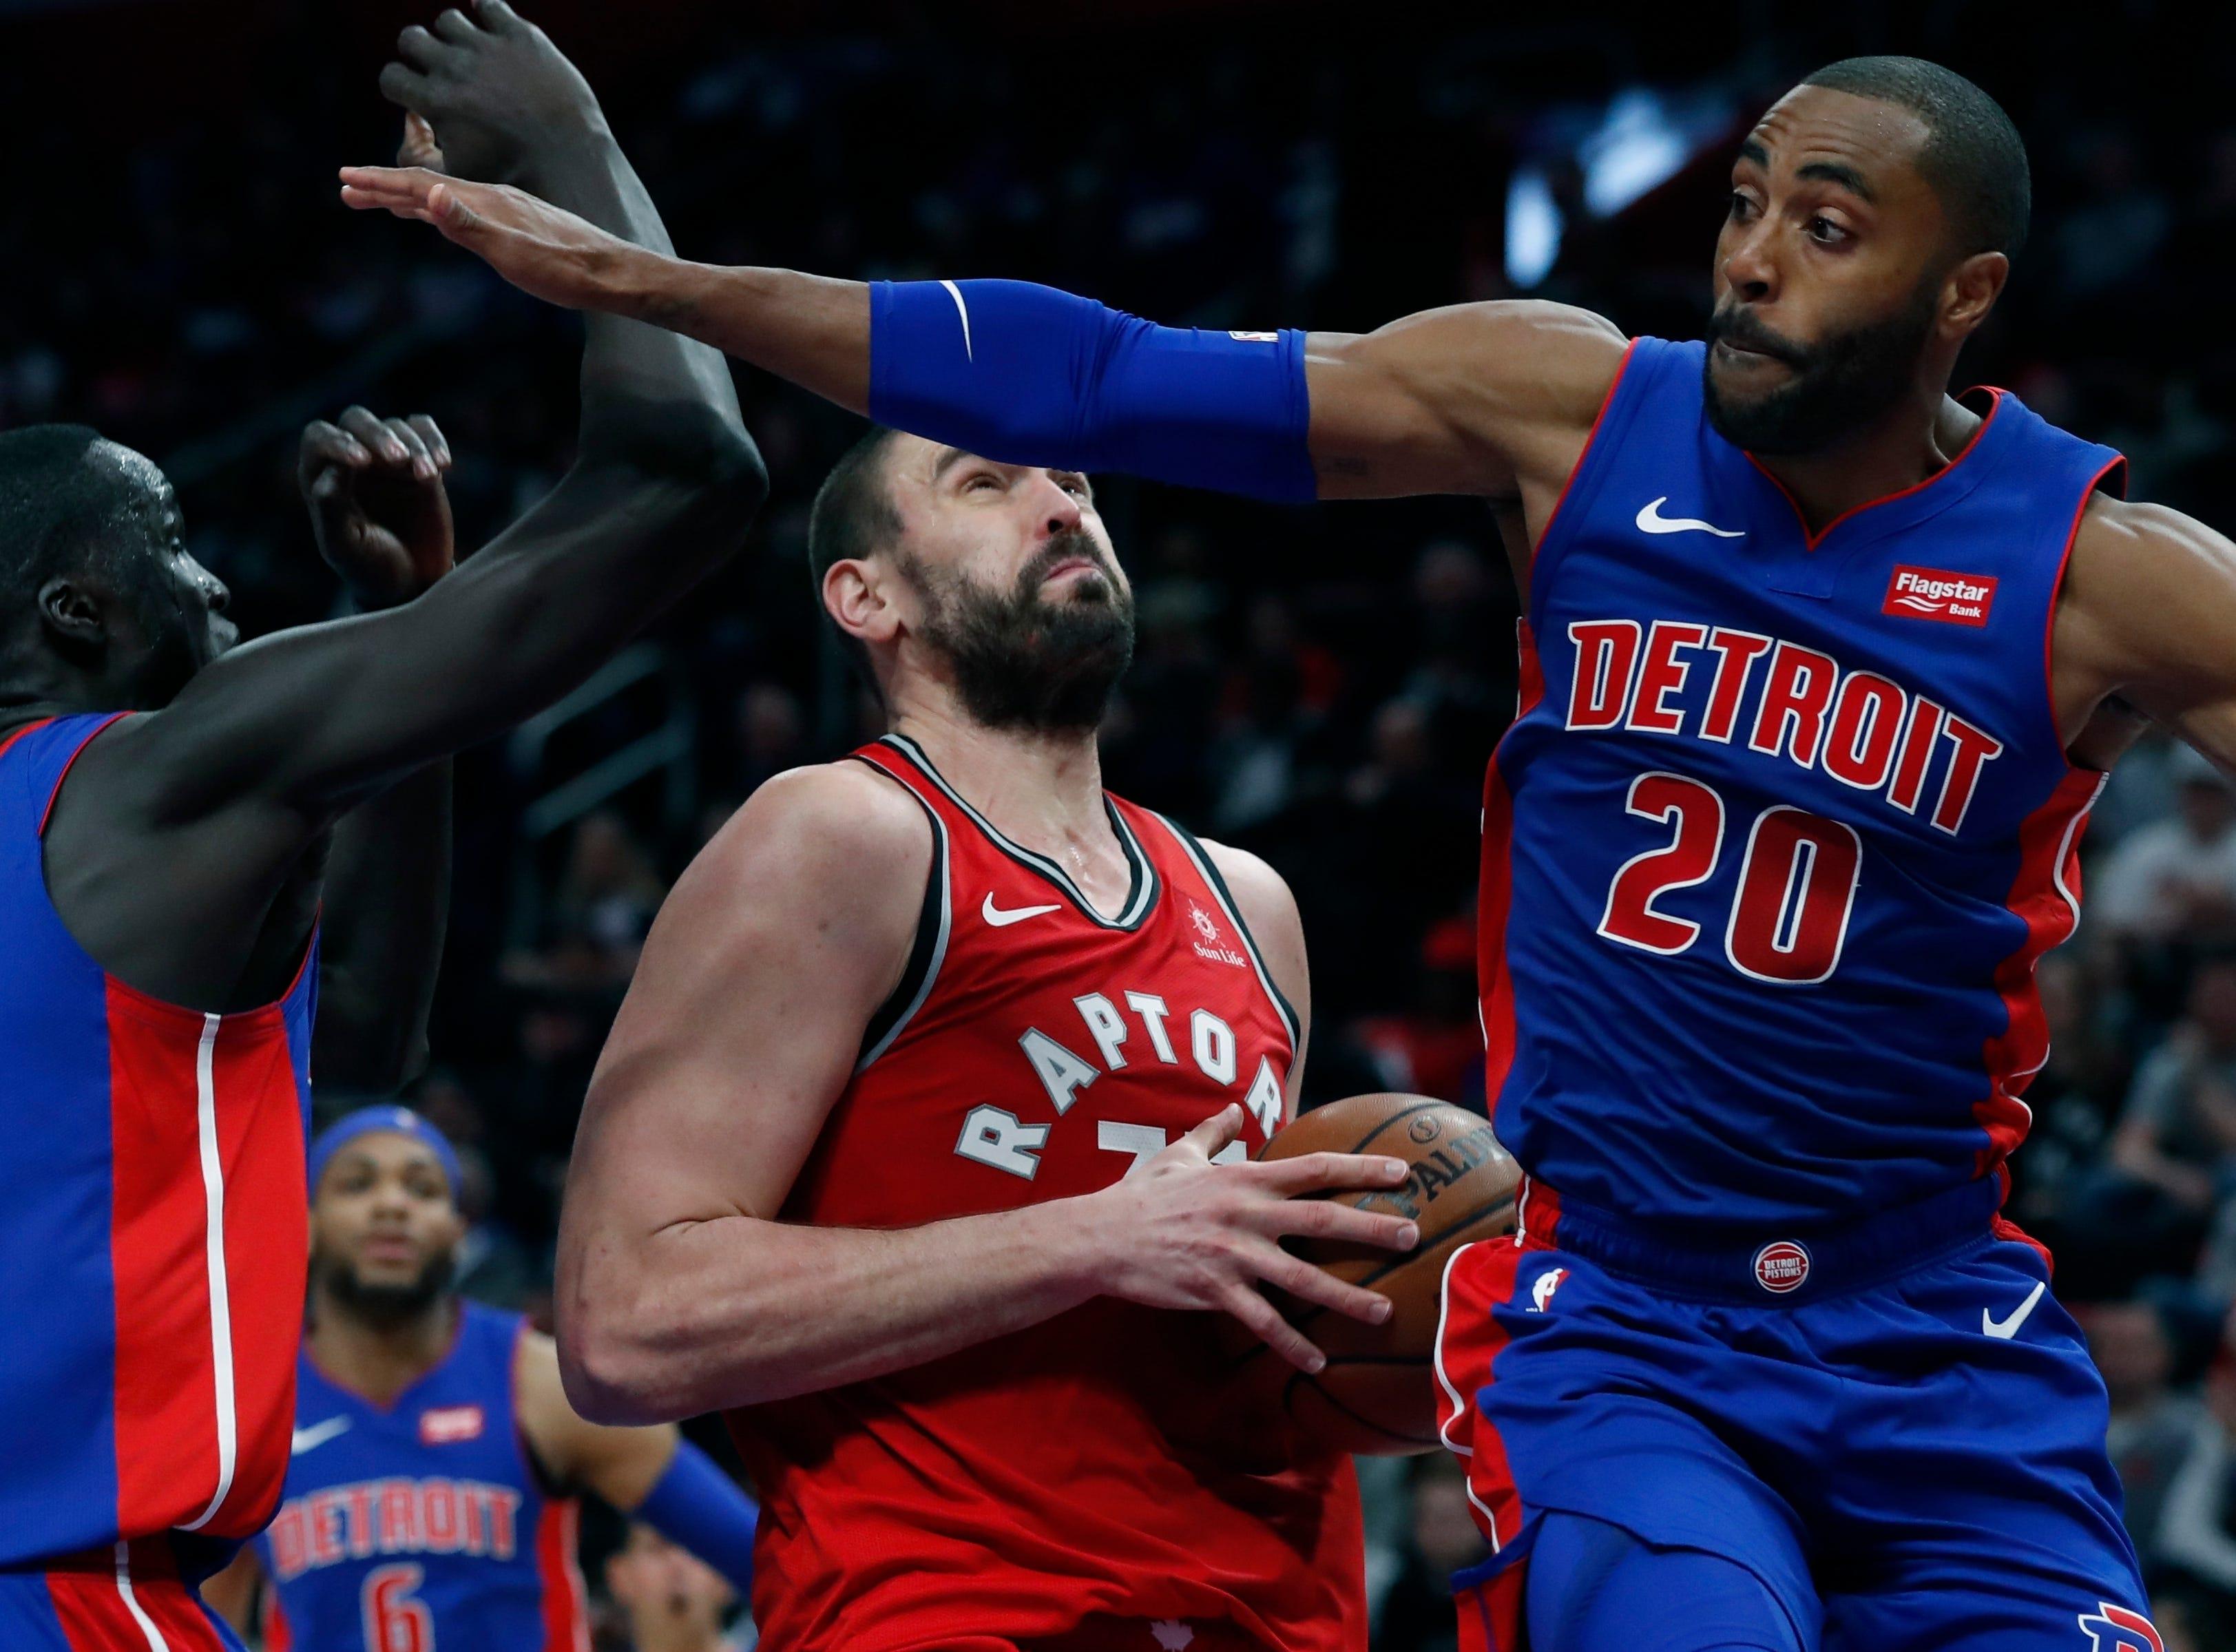 Toronto Raptors center Marc Gasol (33) looks to shoot as Detroit Pistons forward Thon Maker (7) and guard Wayne Ellington (20) defend during the second half.